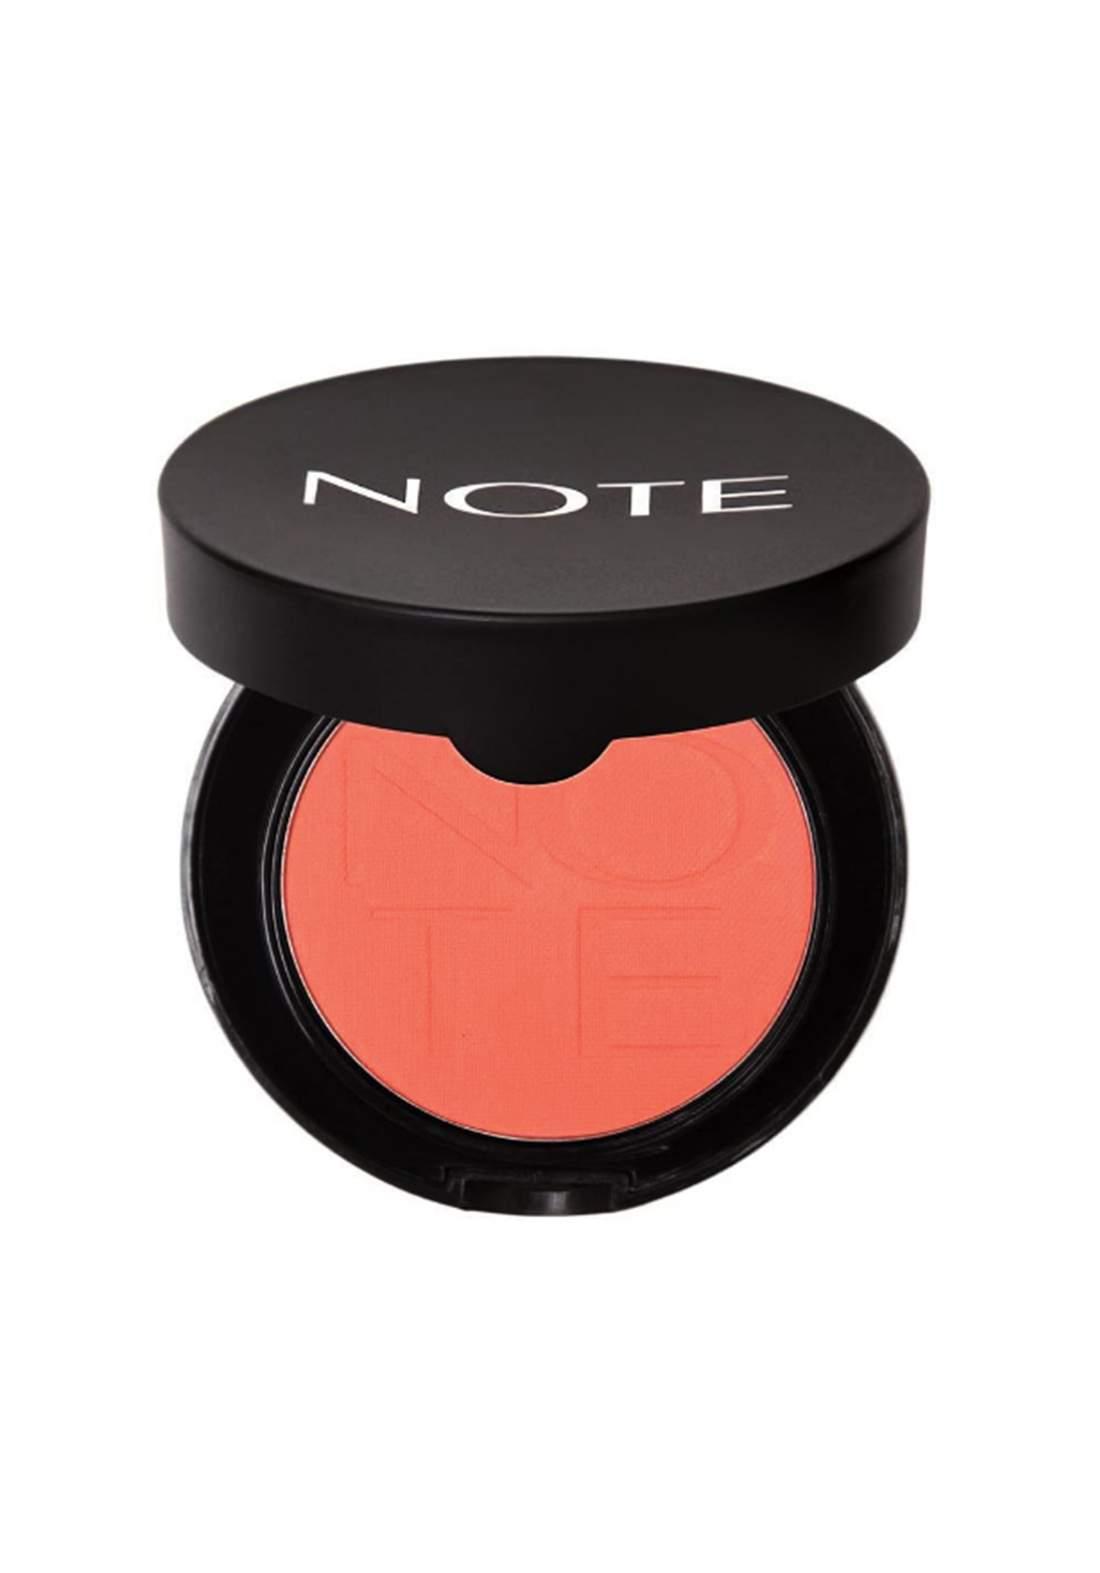 Note Luminous Silk Compact Blusher Pink In Summer No.02 أحمر خدود